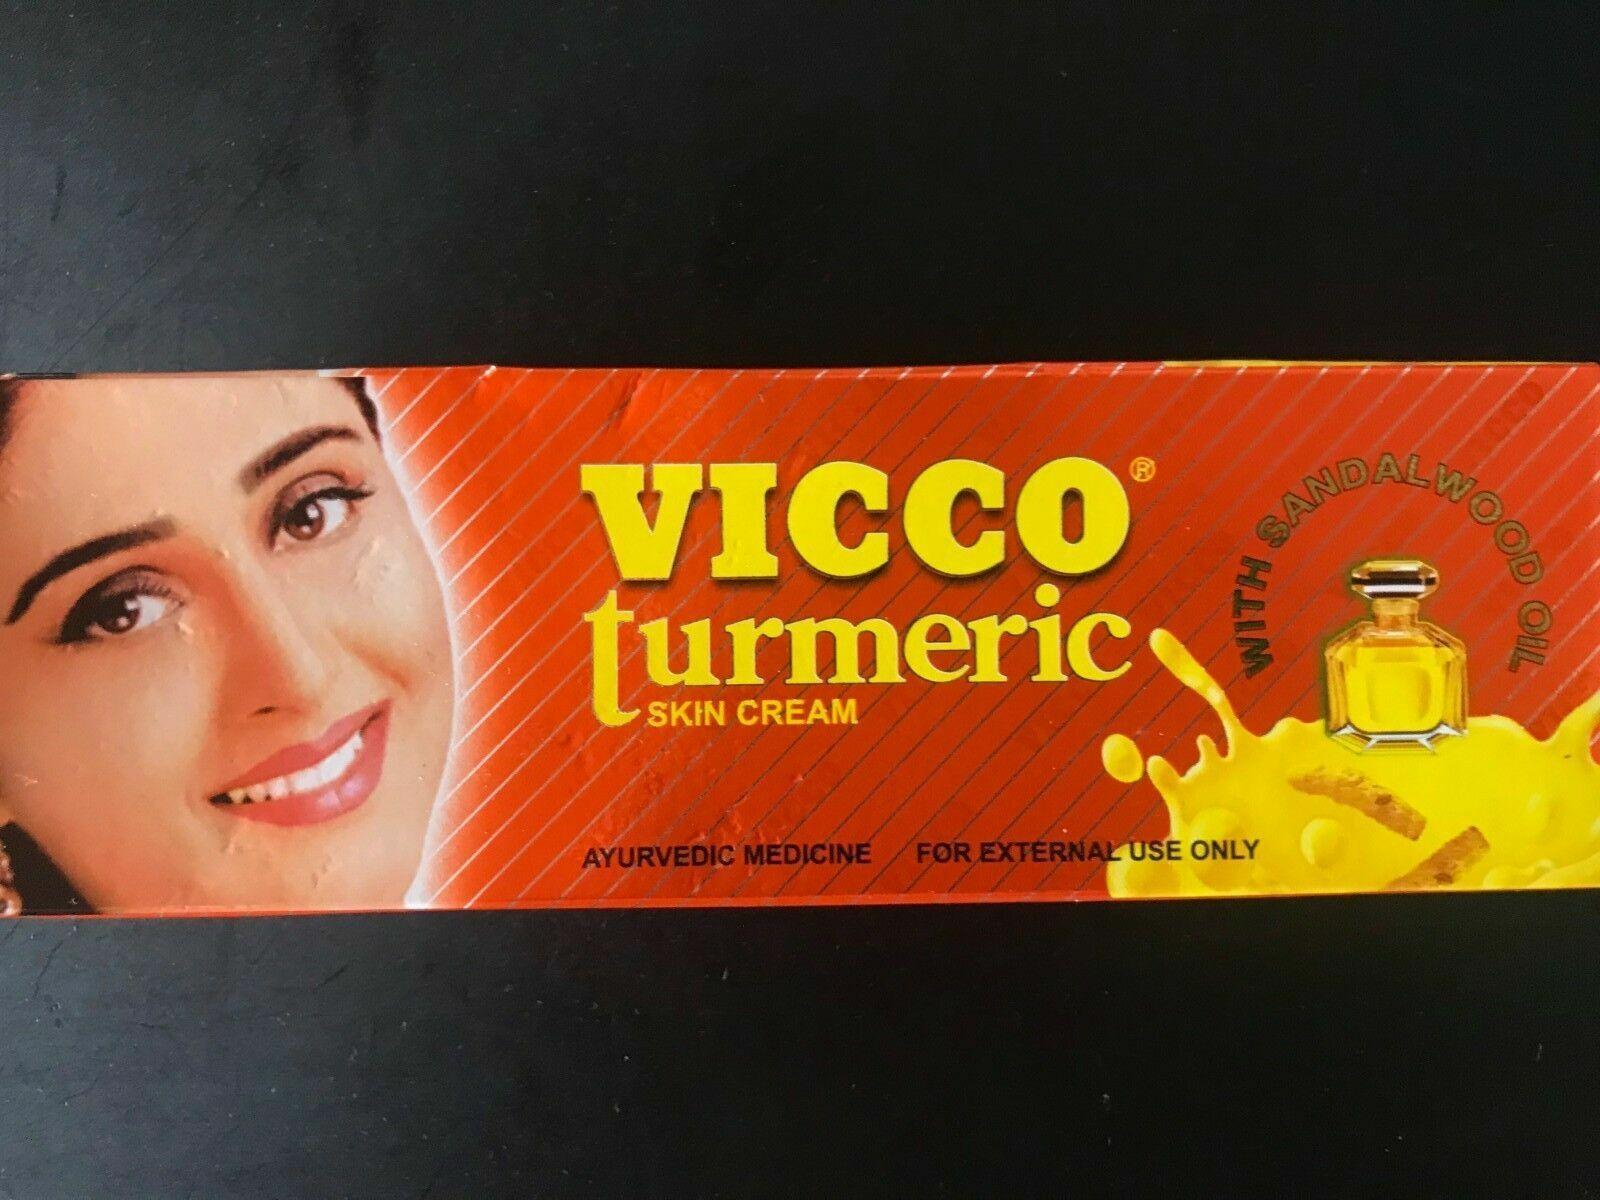 Vicco Turmeric Cream (Ayurvedische Haut-Creme mit Sandelholzöl) 30g Neu Verpackt